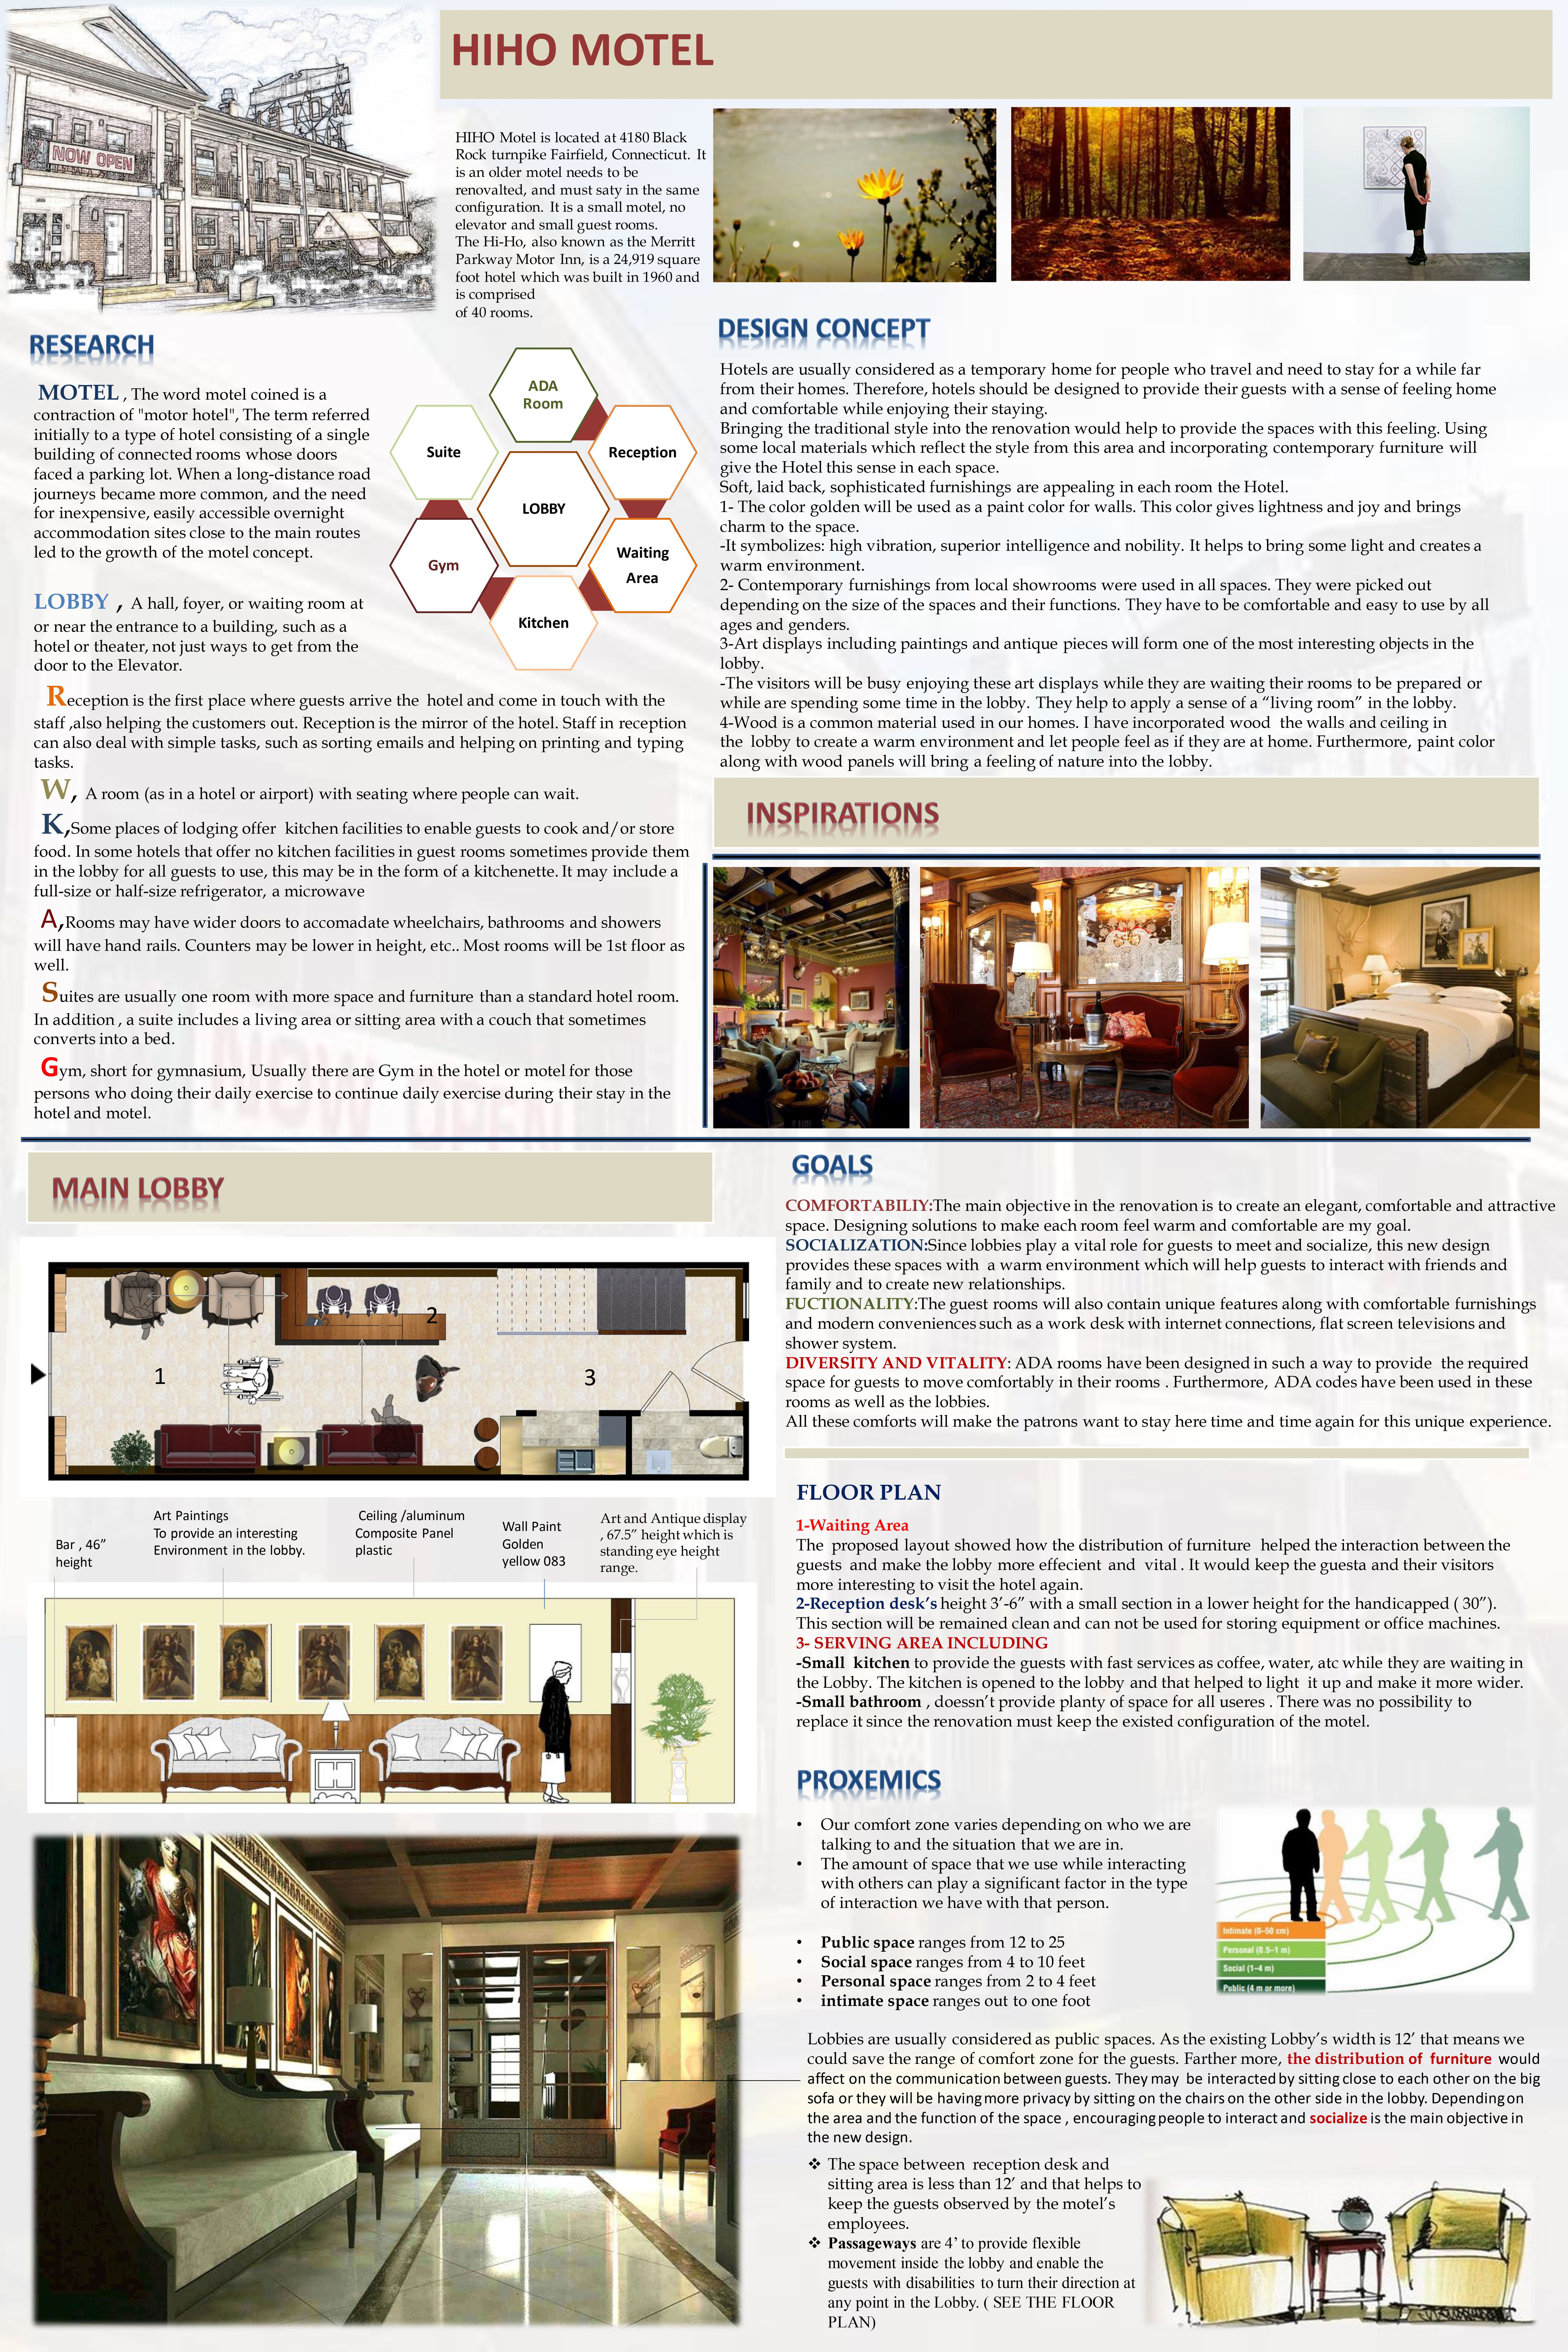 Human Factor studies of HIHO Motel Design